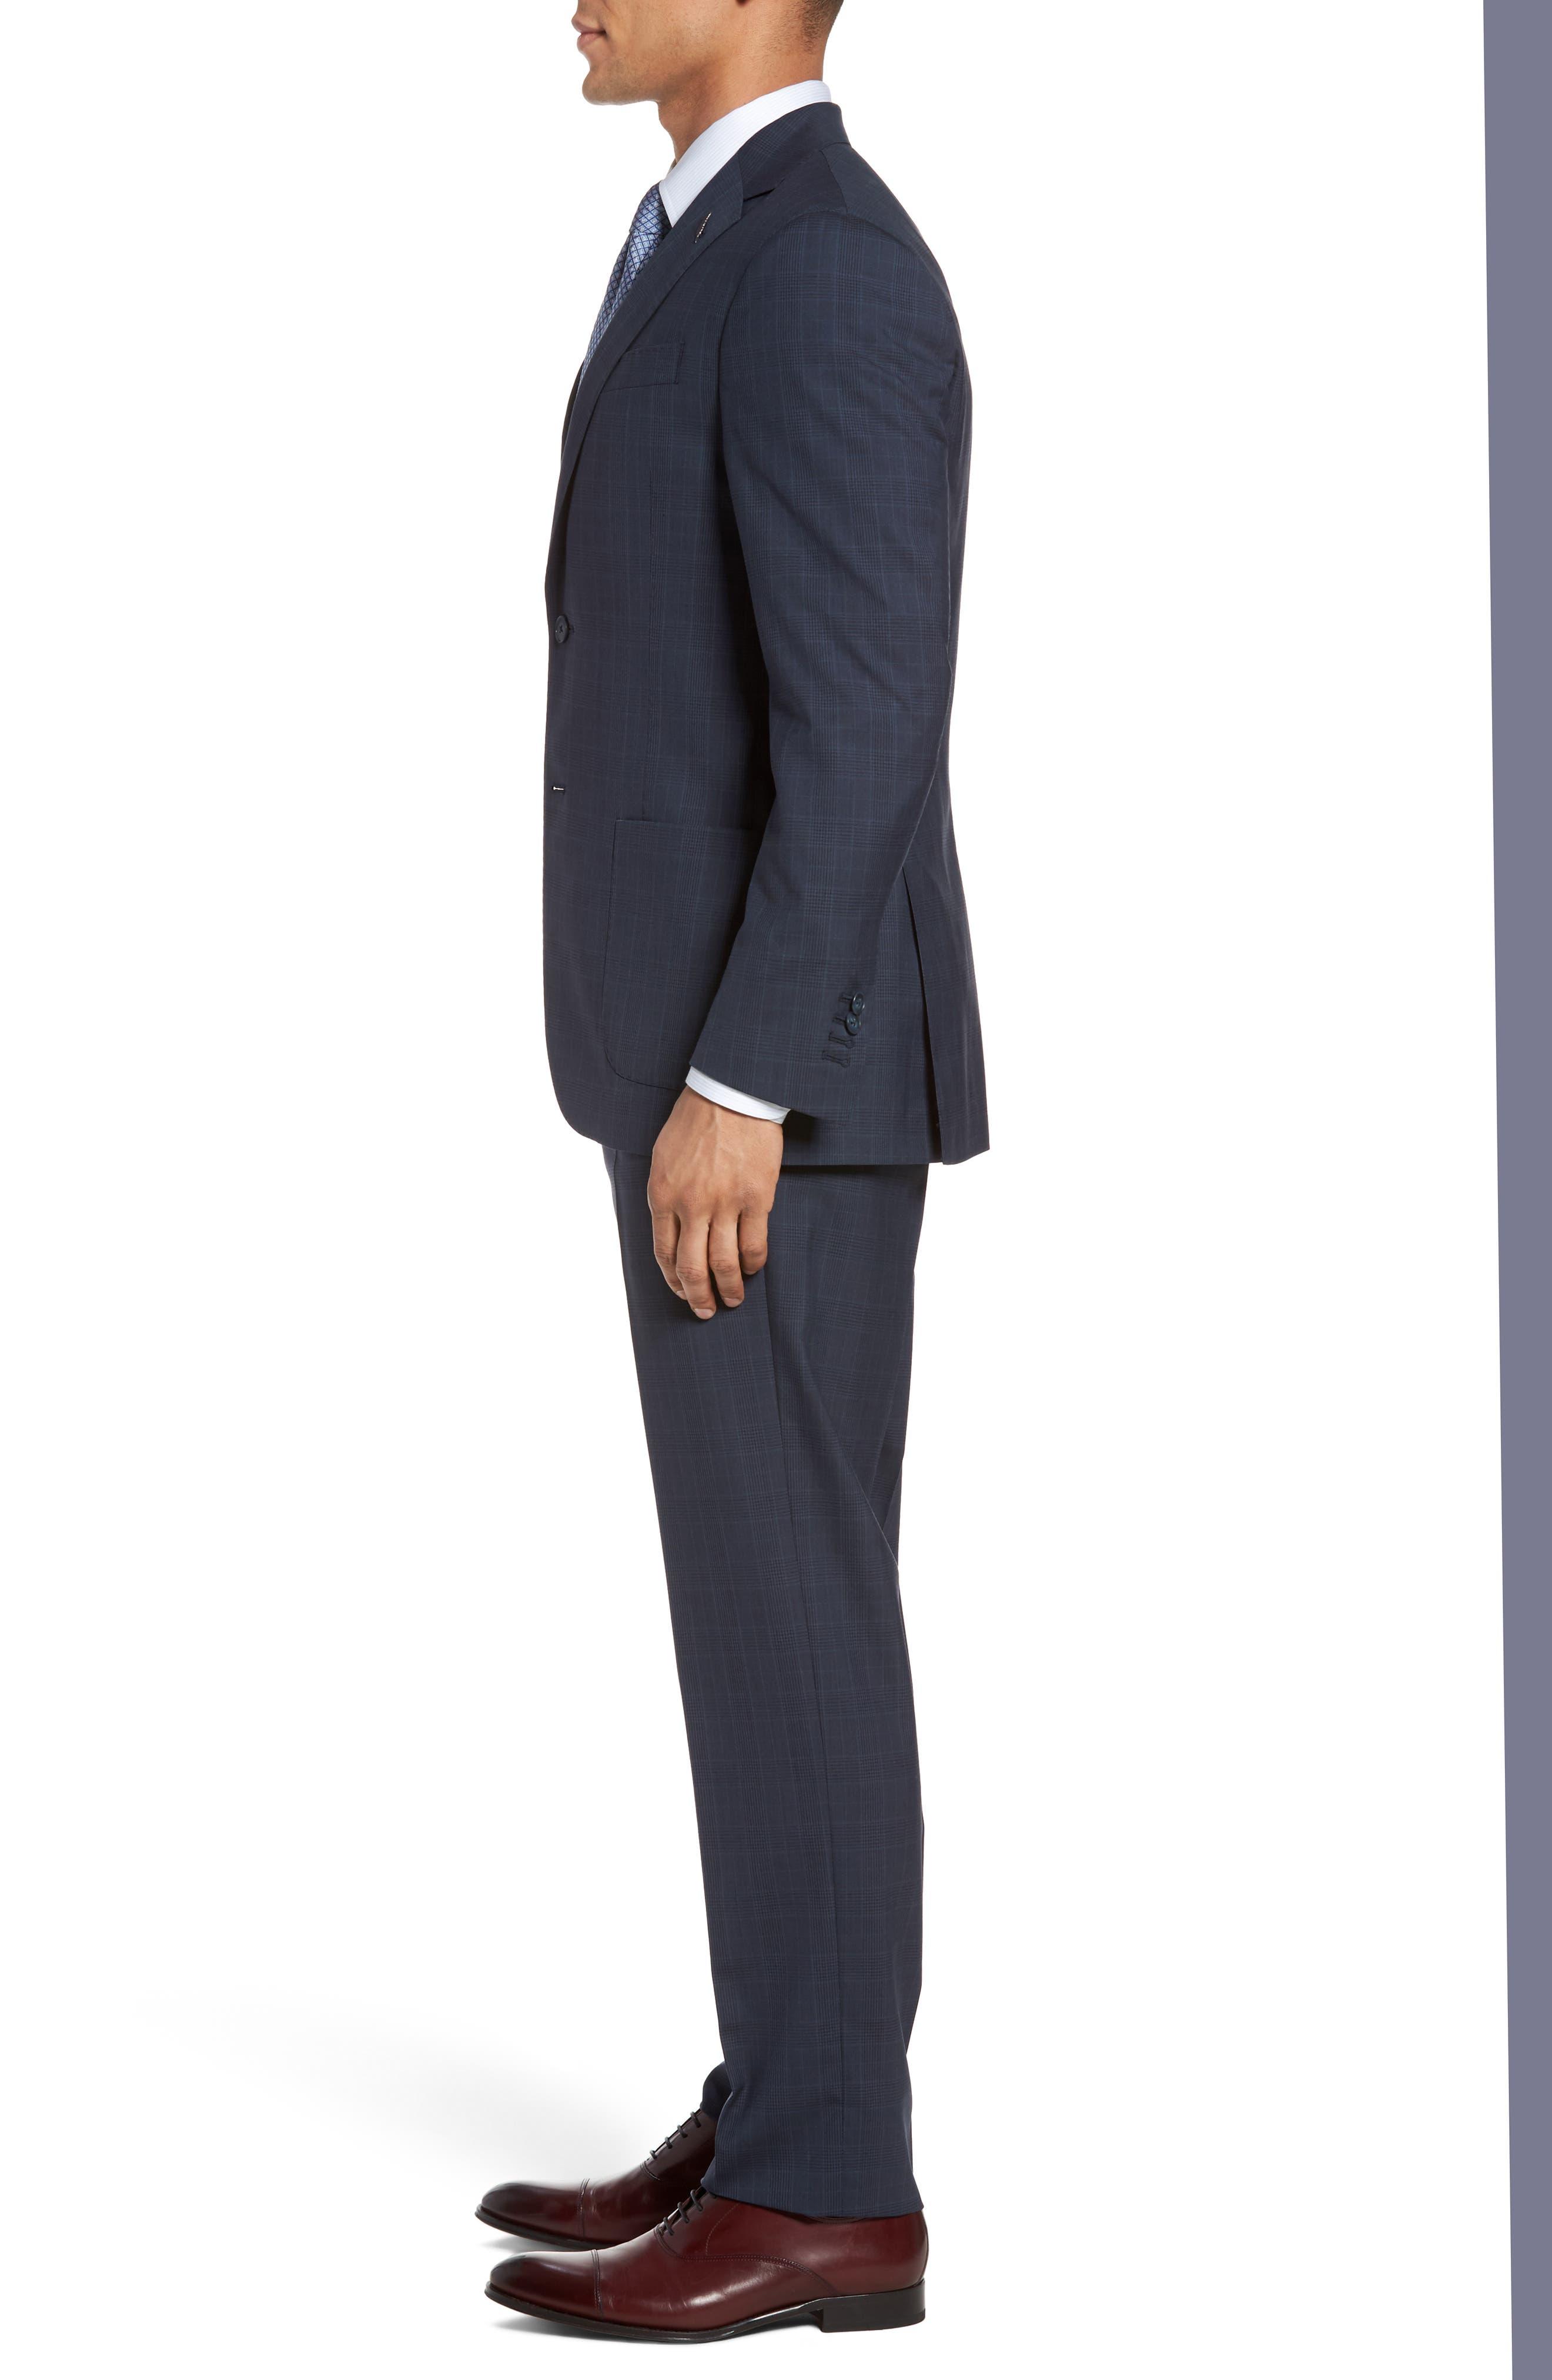 Alternate Image 3  - Michael Bastian Classic Fit Plaid Wool Suit